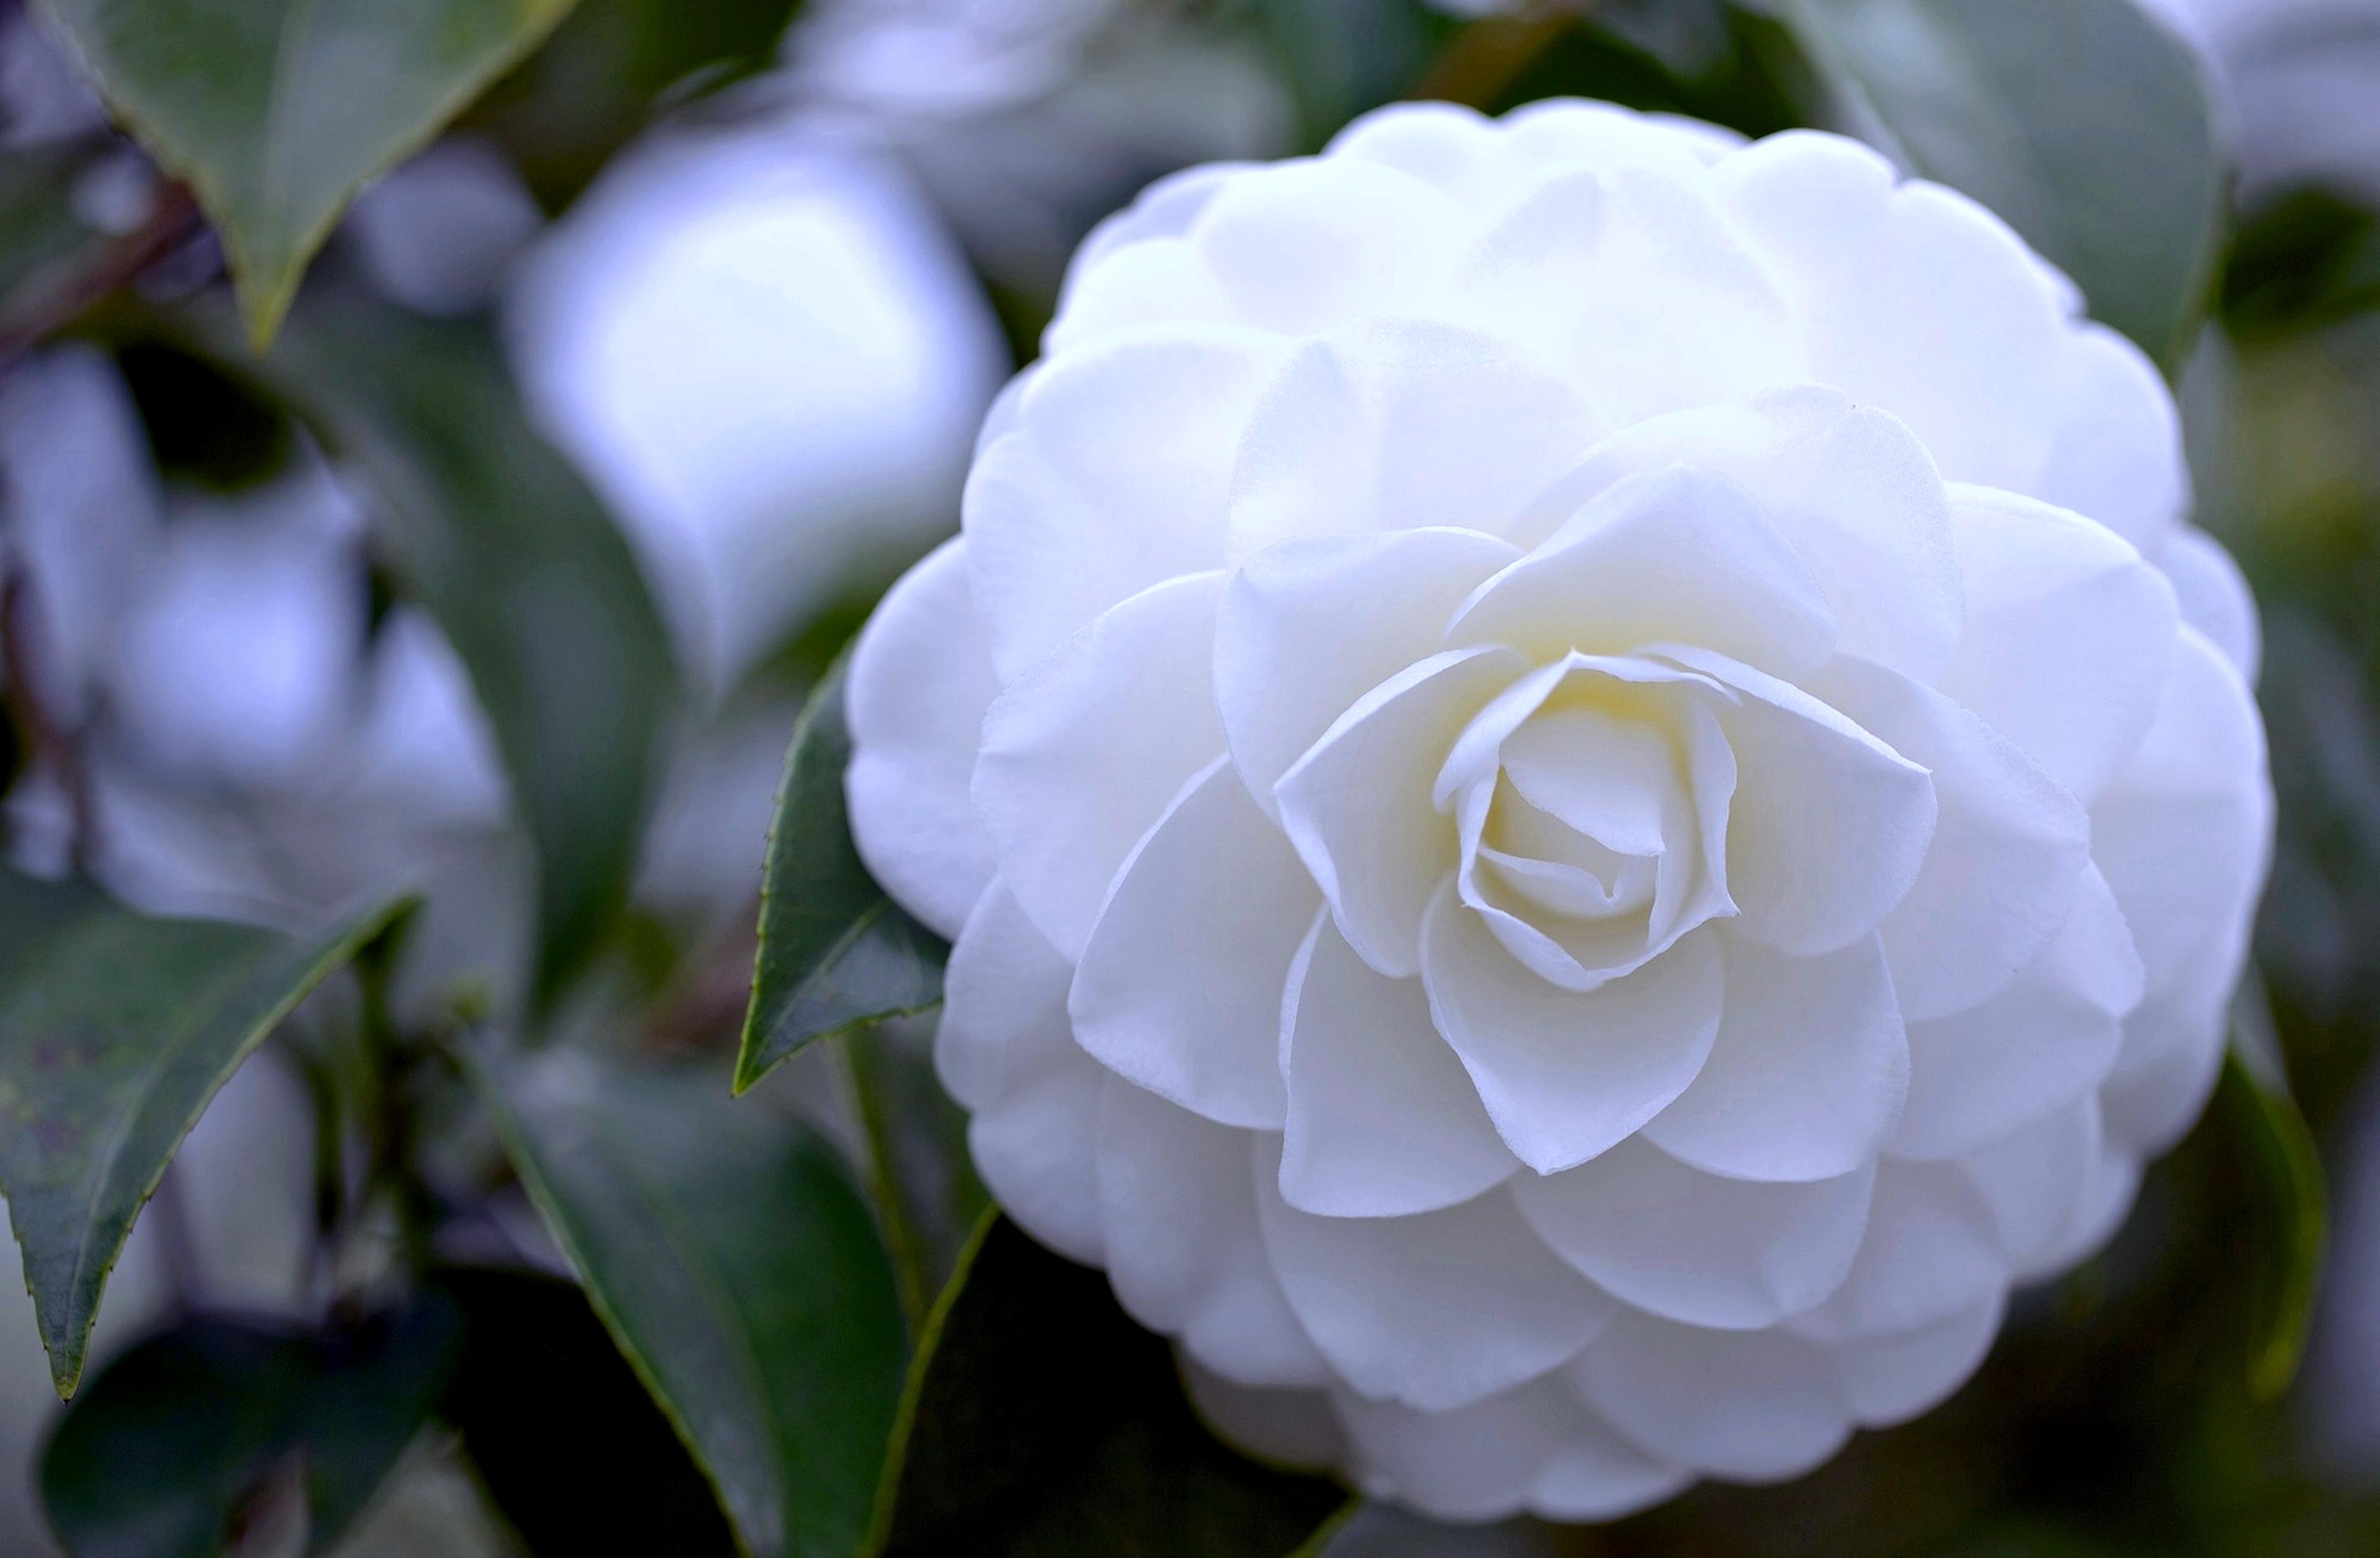 White Camellia Camelia Hd 740811 Hd Wallpaper Backgrounds